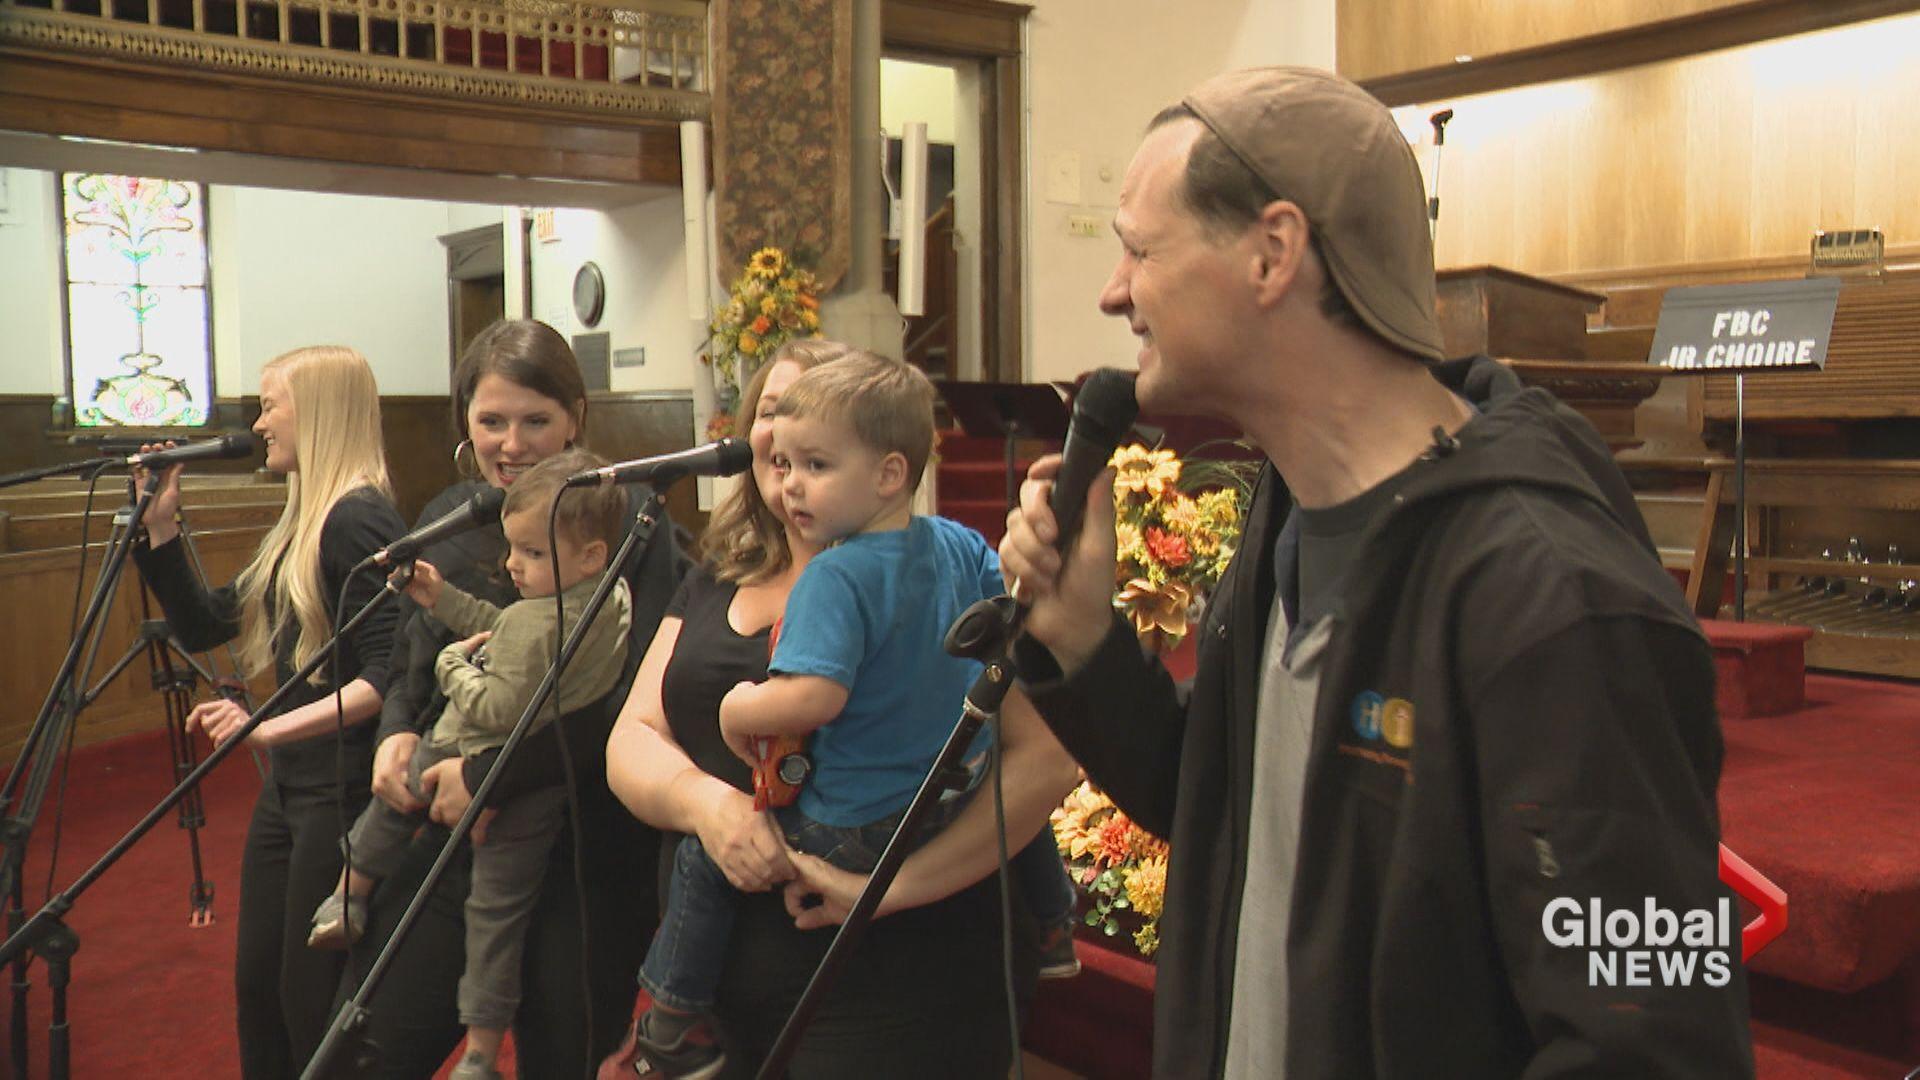 Calgary choir organizes city's first World Singing Day event